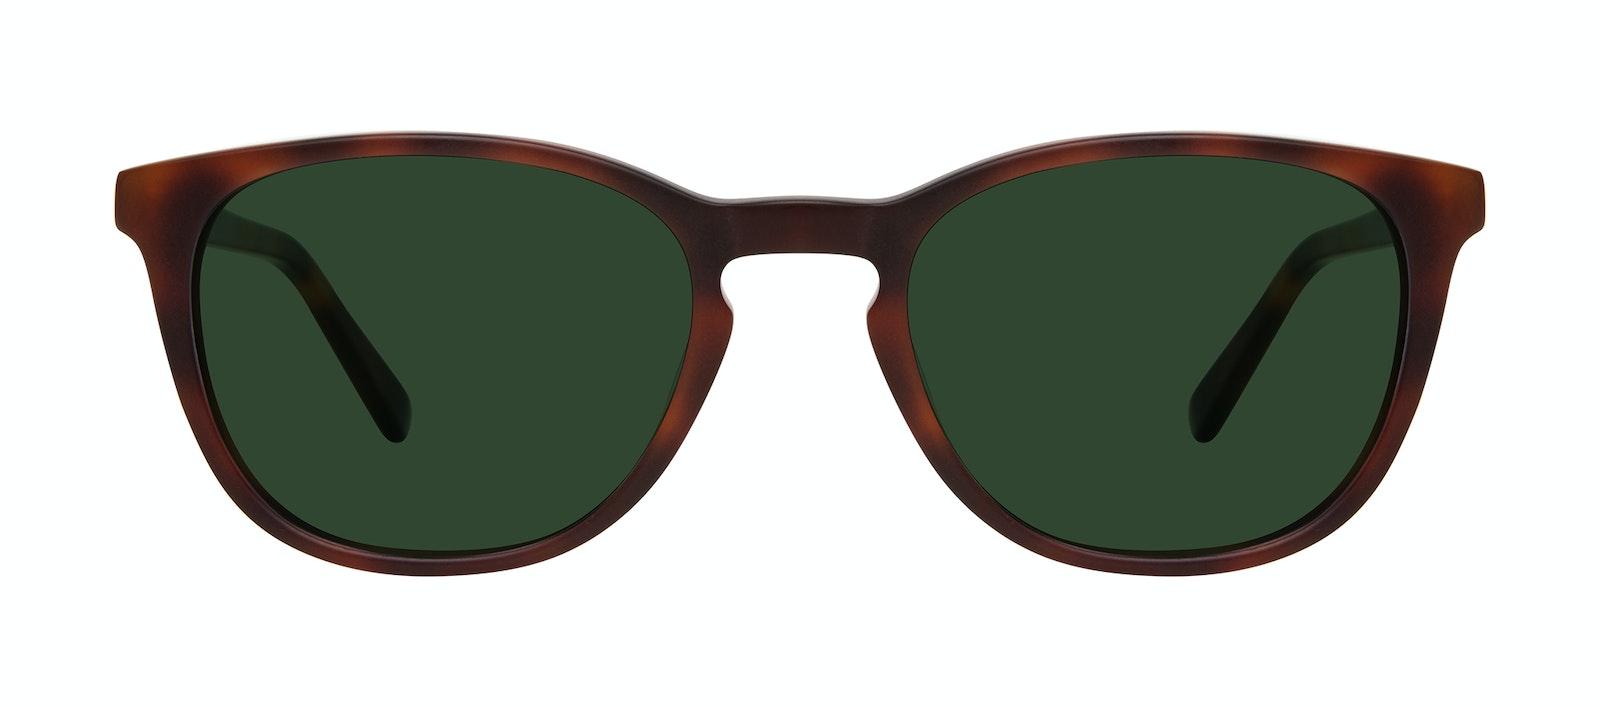 Affordable Fashion Glasses Square Sunglasses Men Swerve Matte Tortoise Front